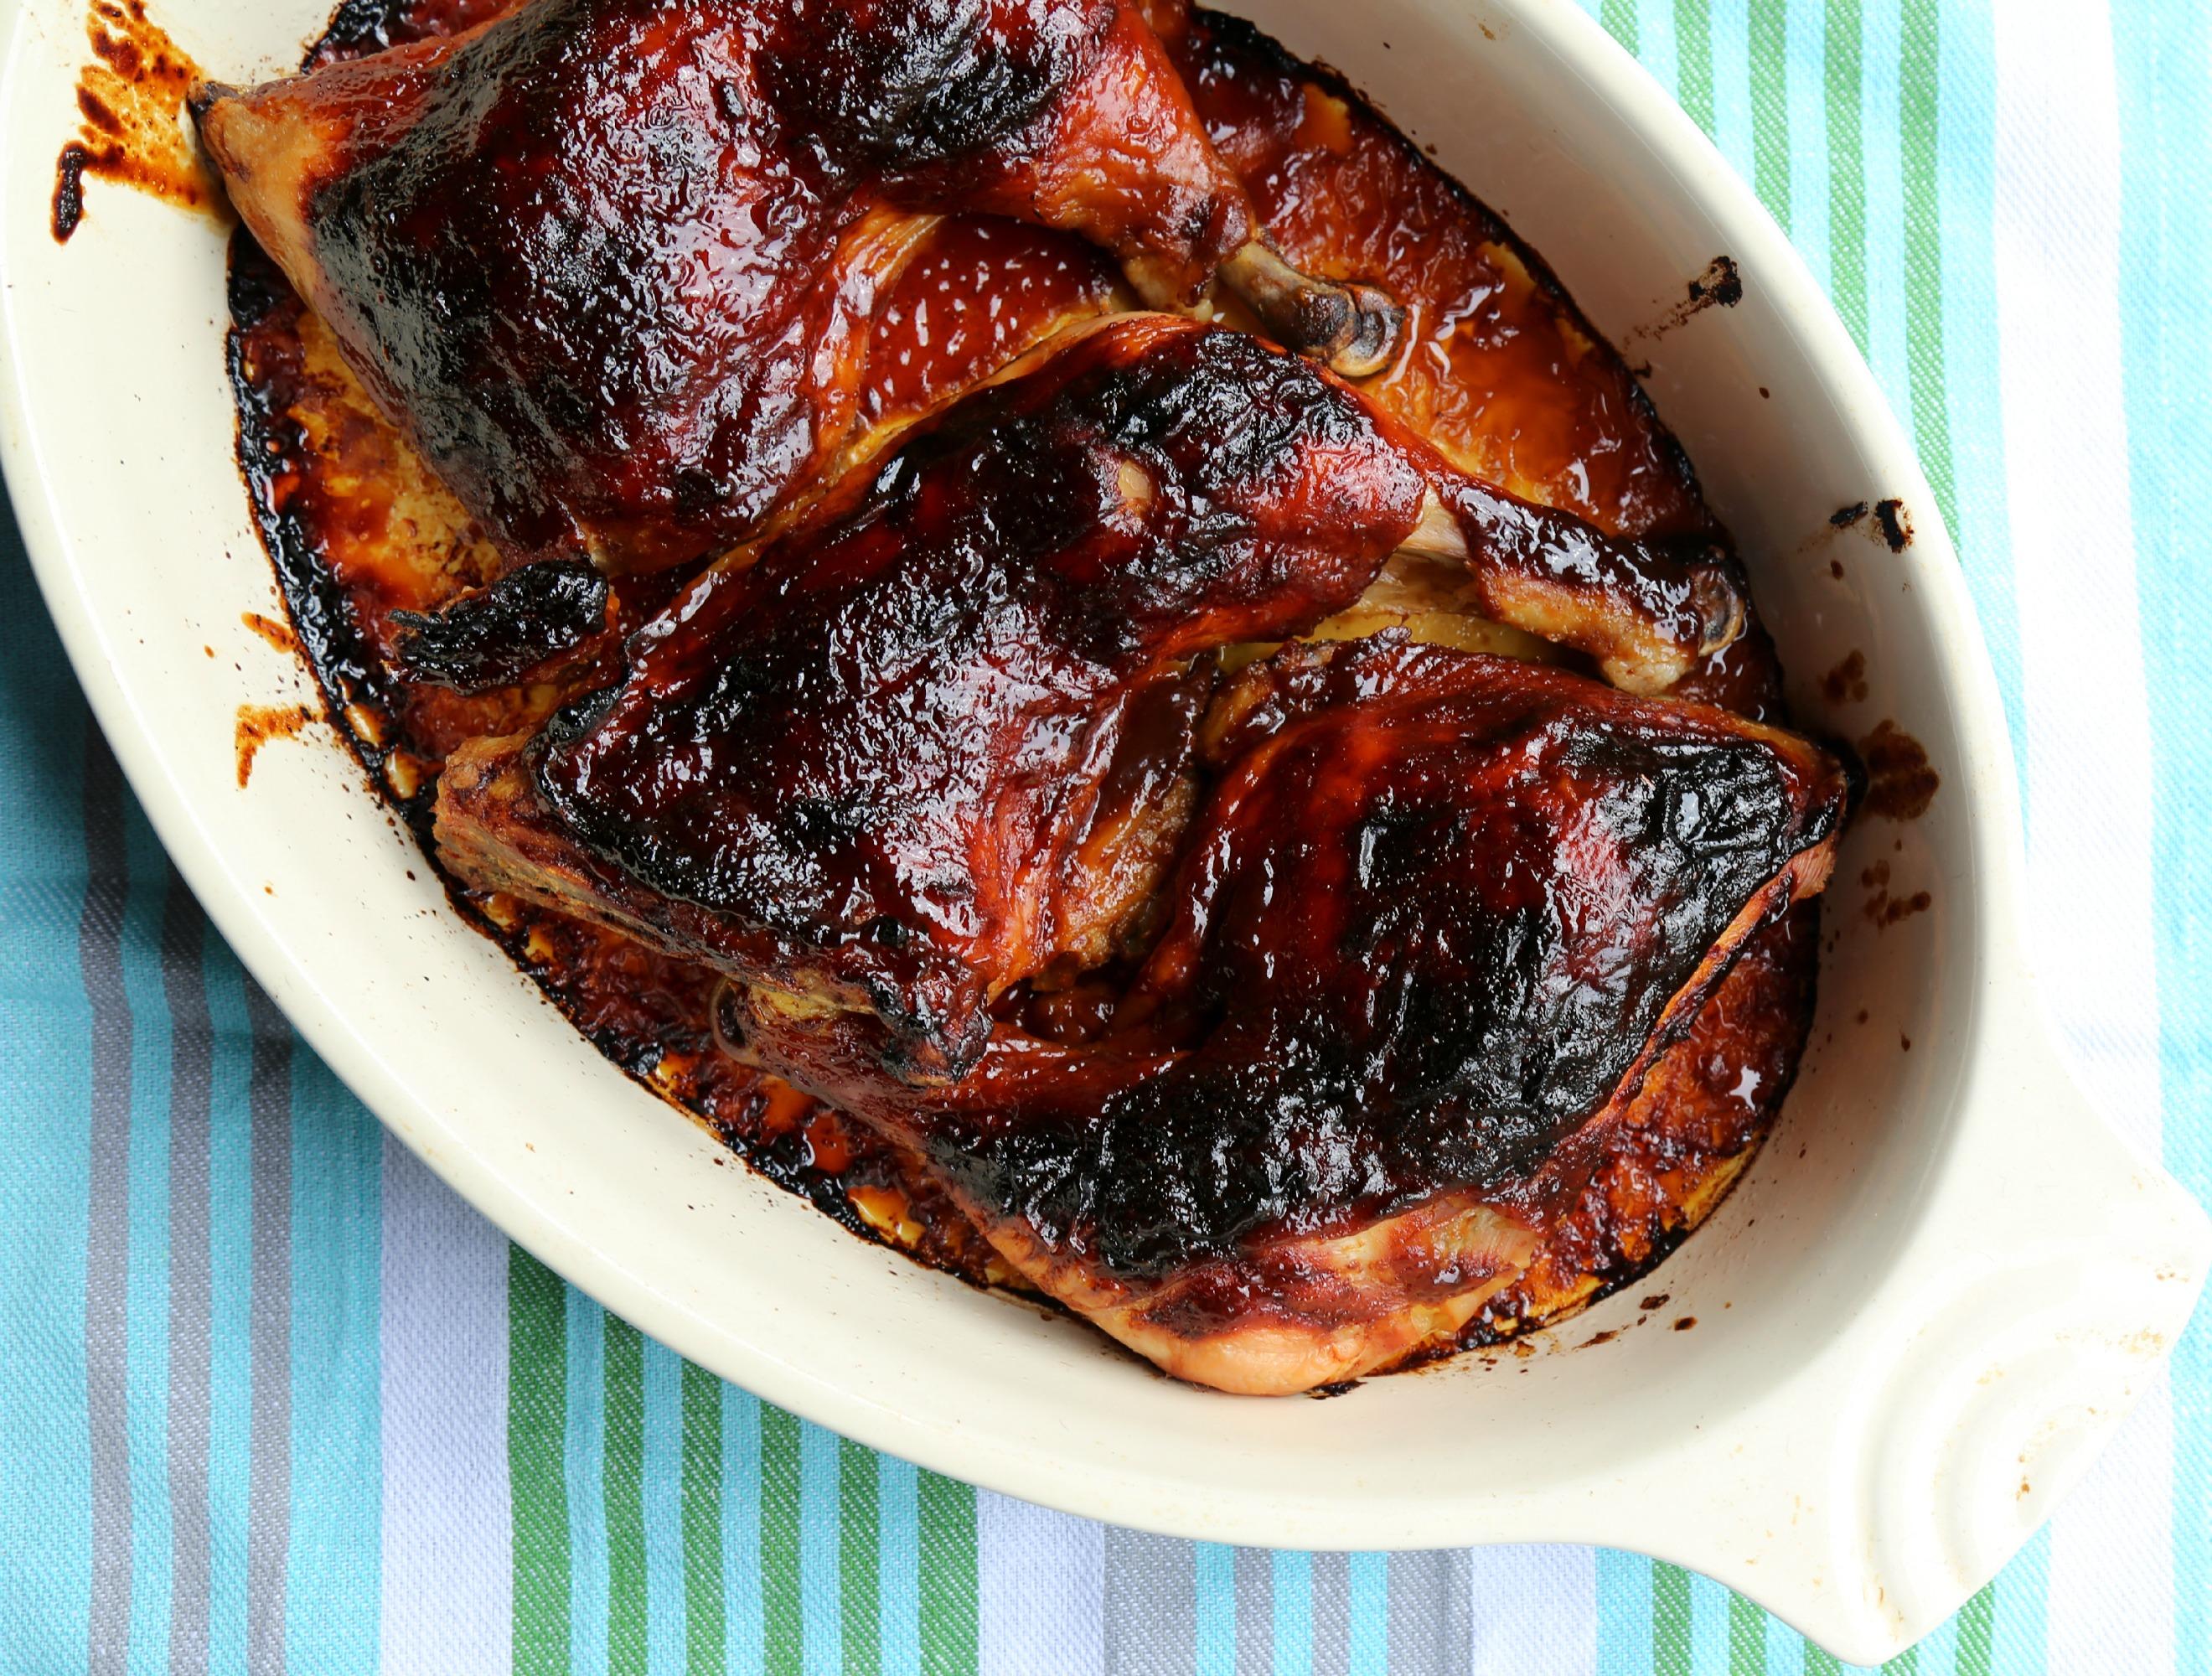 baked-bbq-chicken-easy-coffee-sauce-VianneyRodriguez-sweetlifebake